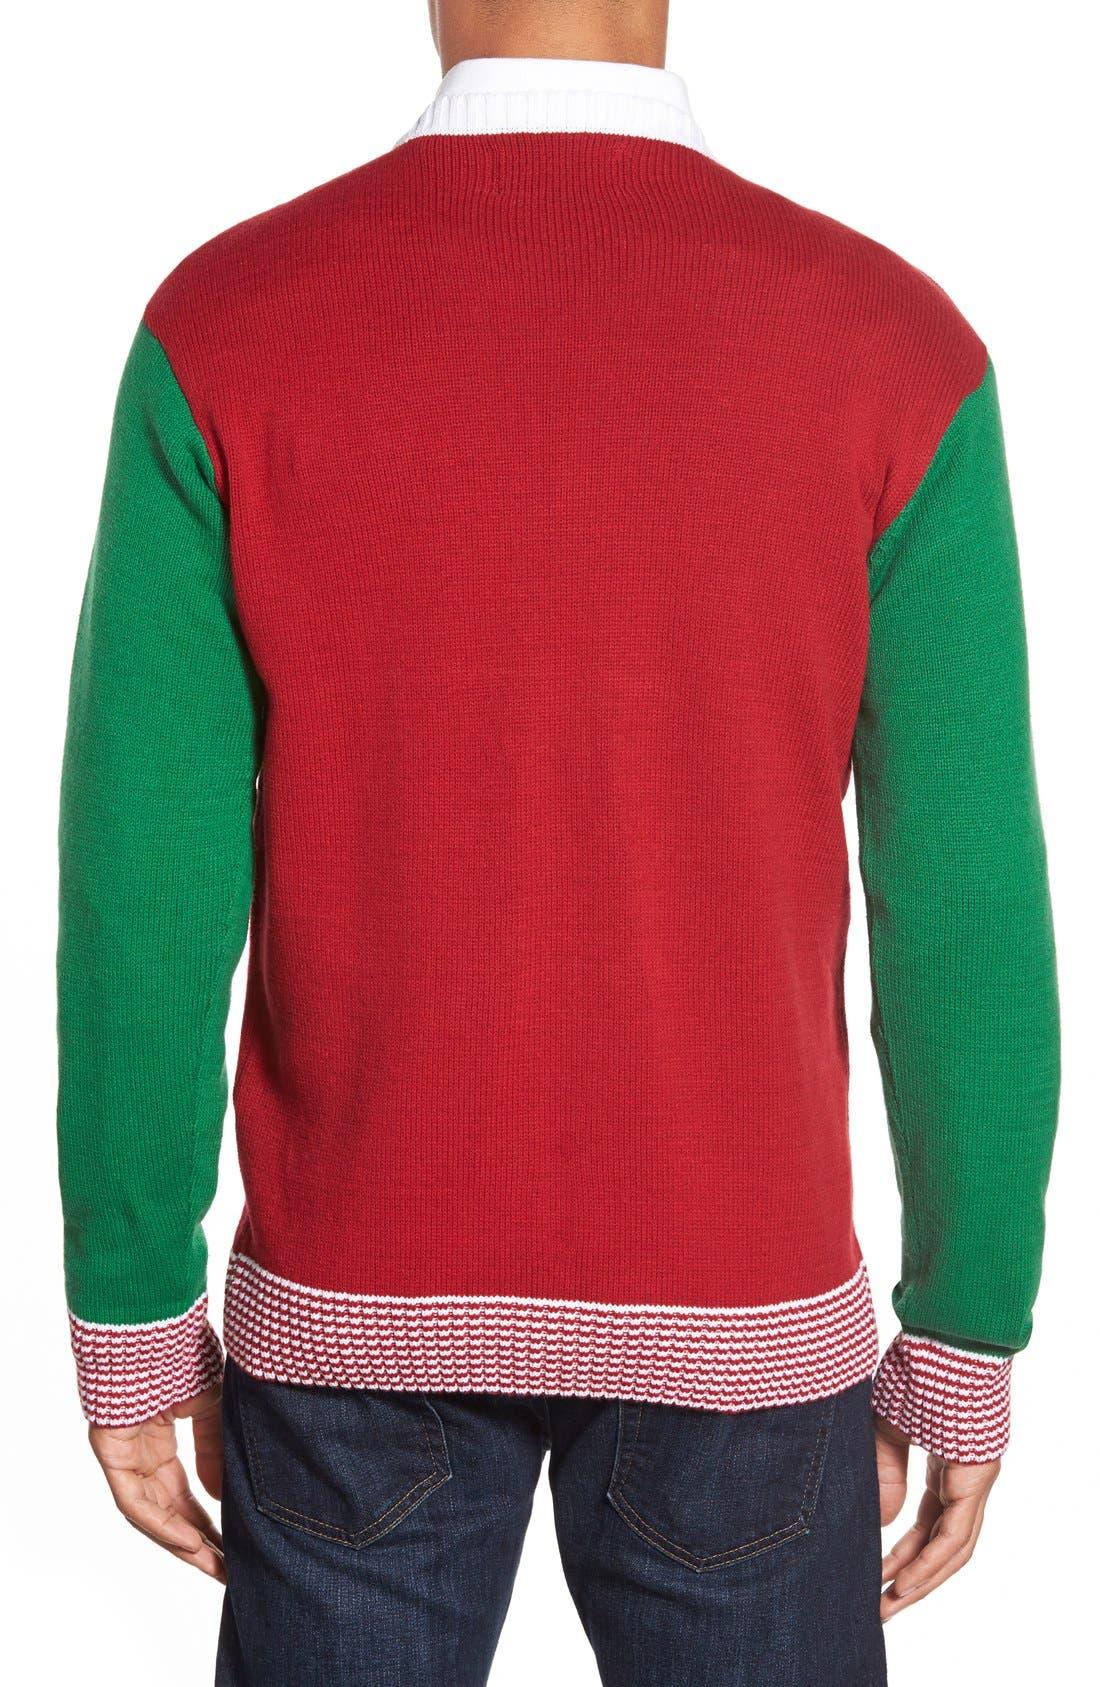 Alternate Image 2  - Ugly Christmas Sweater 'Nutcracker Face' Holiday Crewneck Sweater